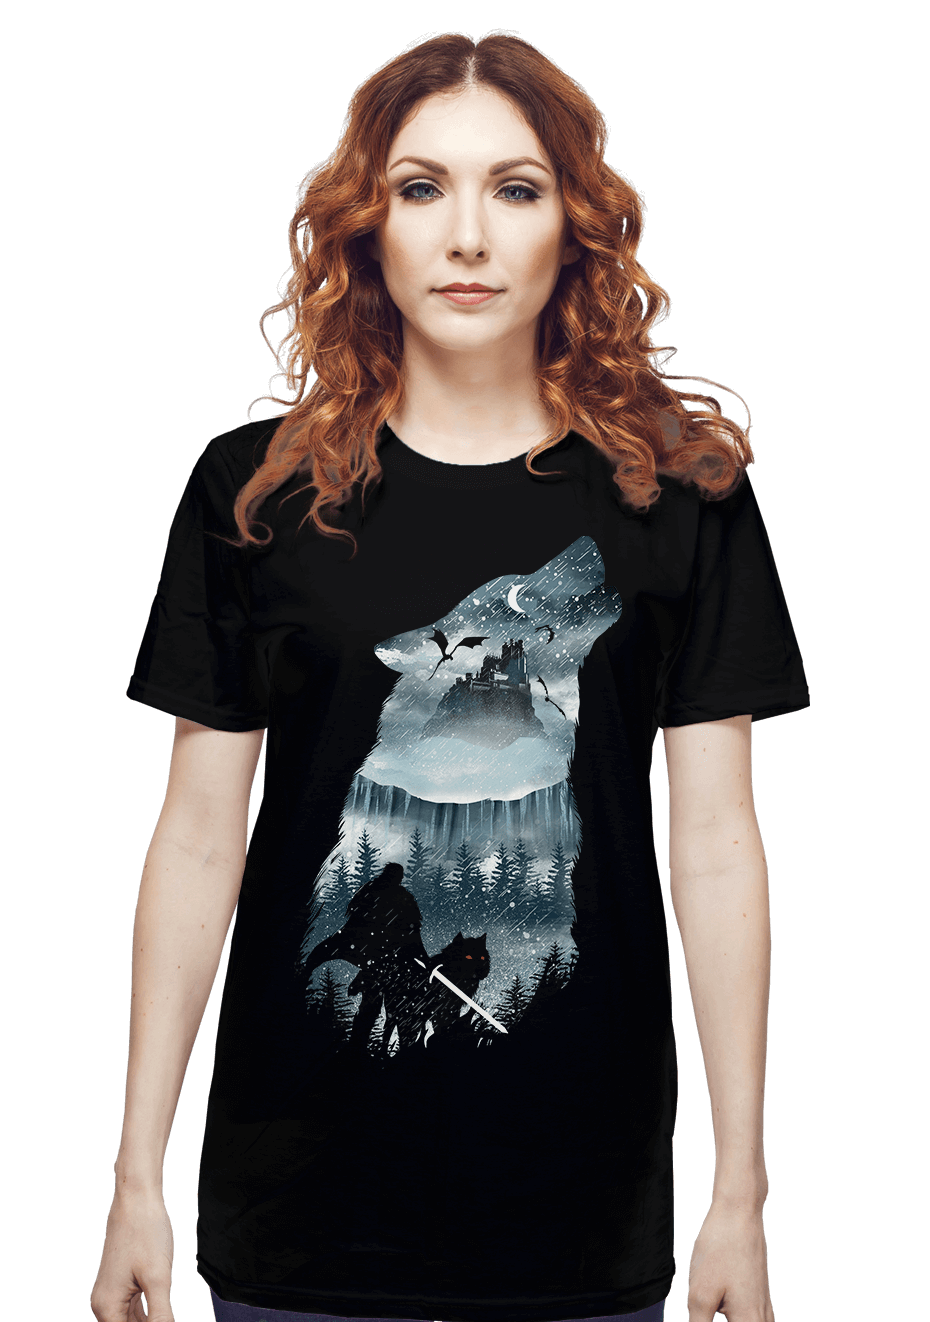 Winter Has Come - GoT T-Shirt